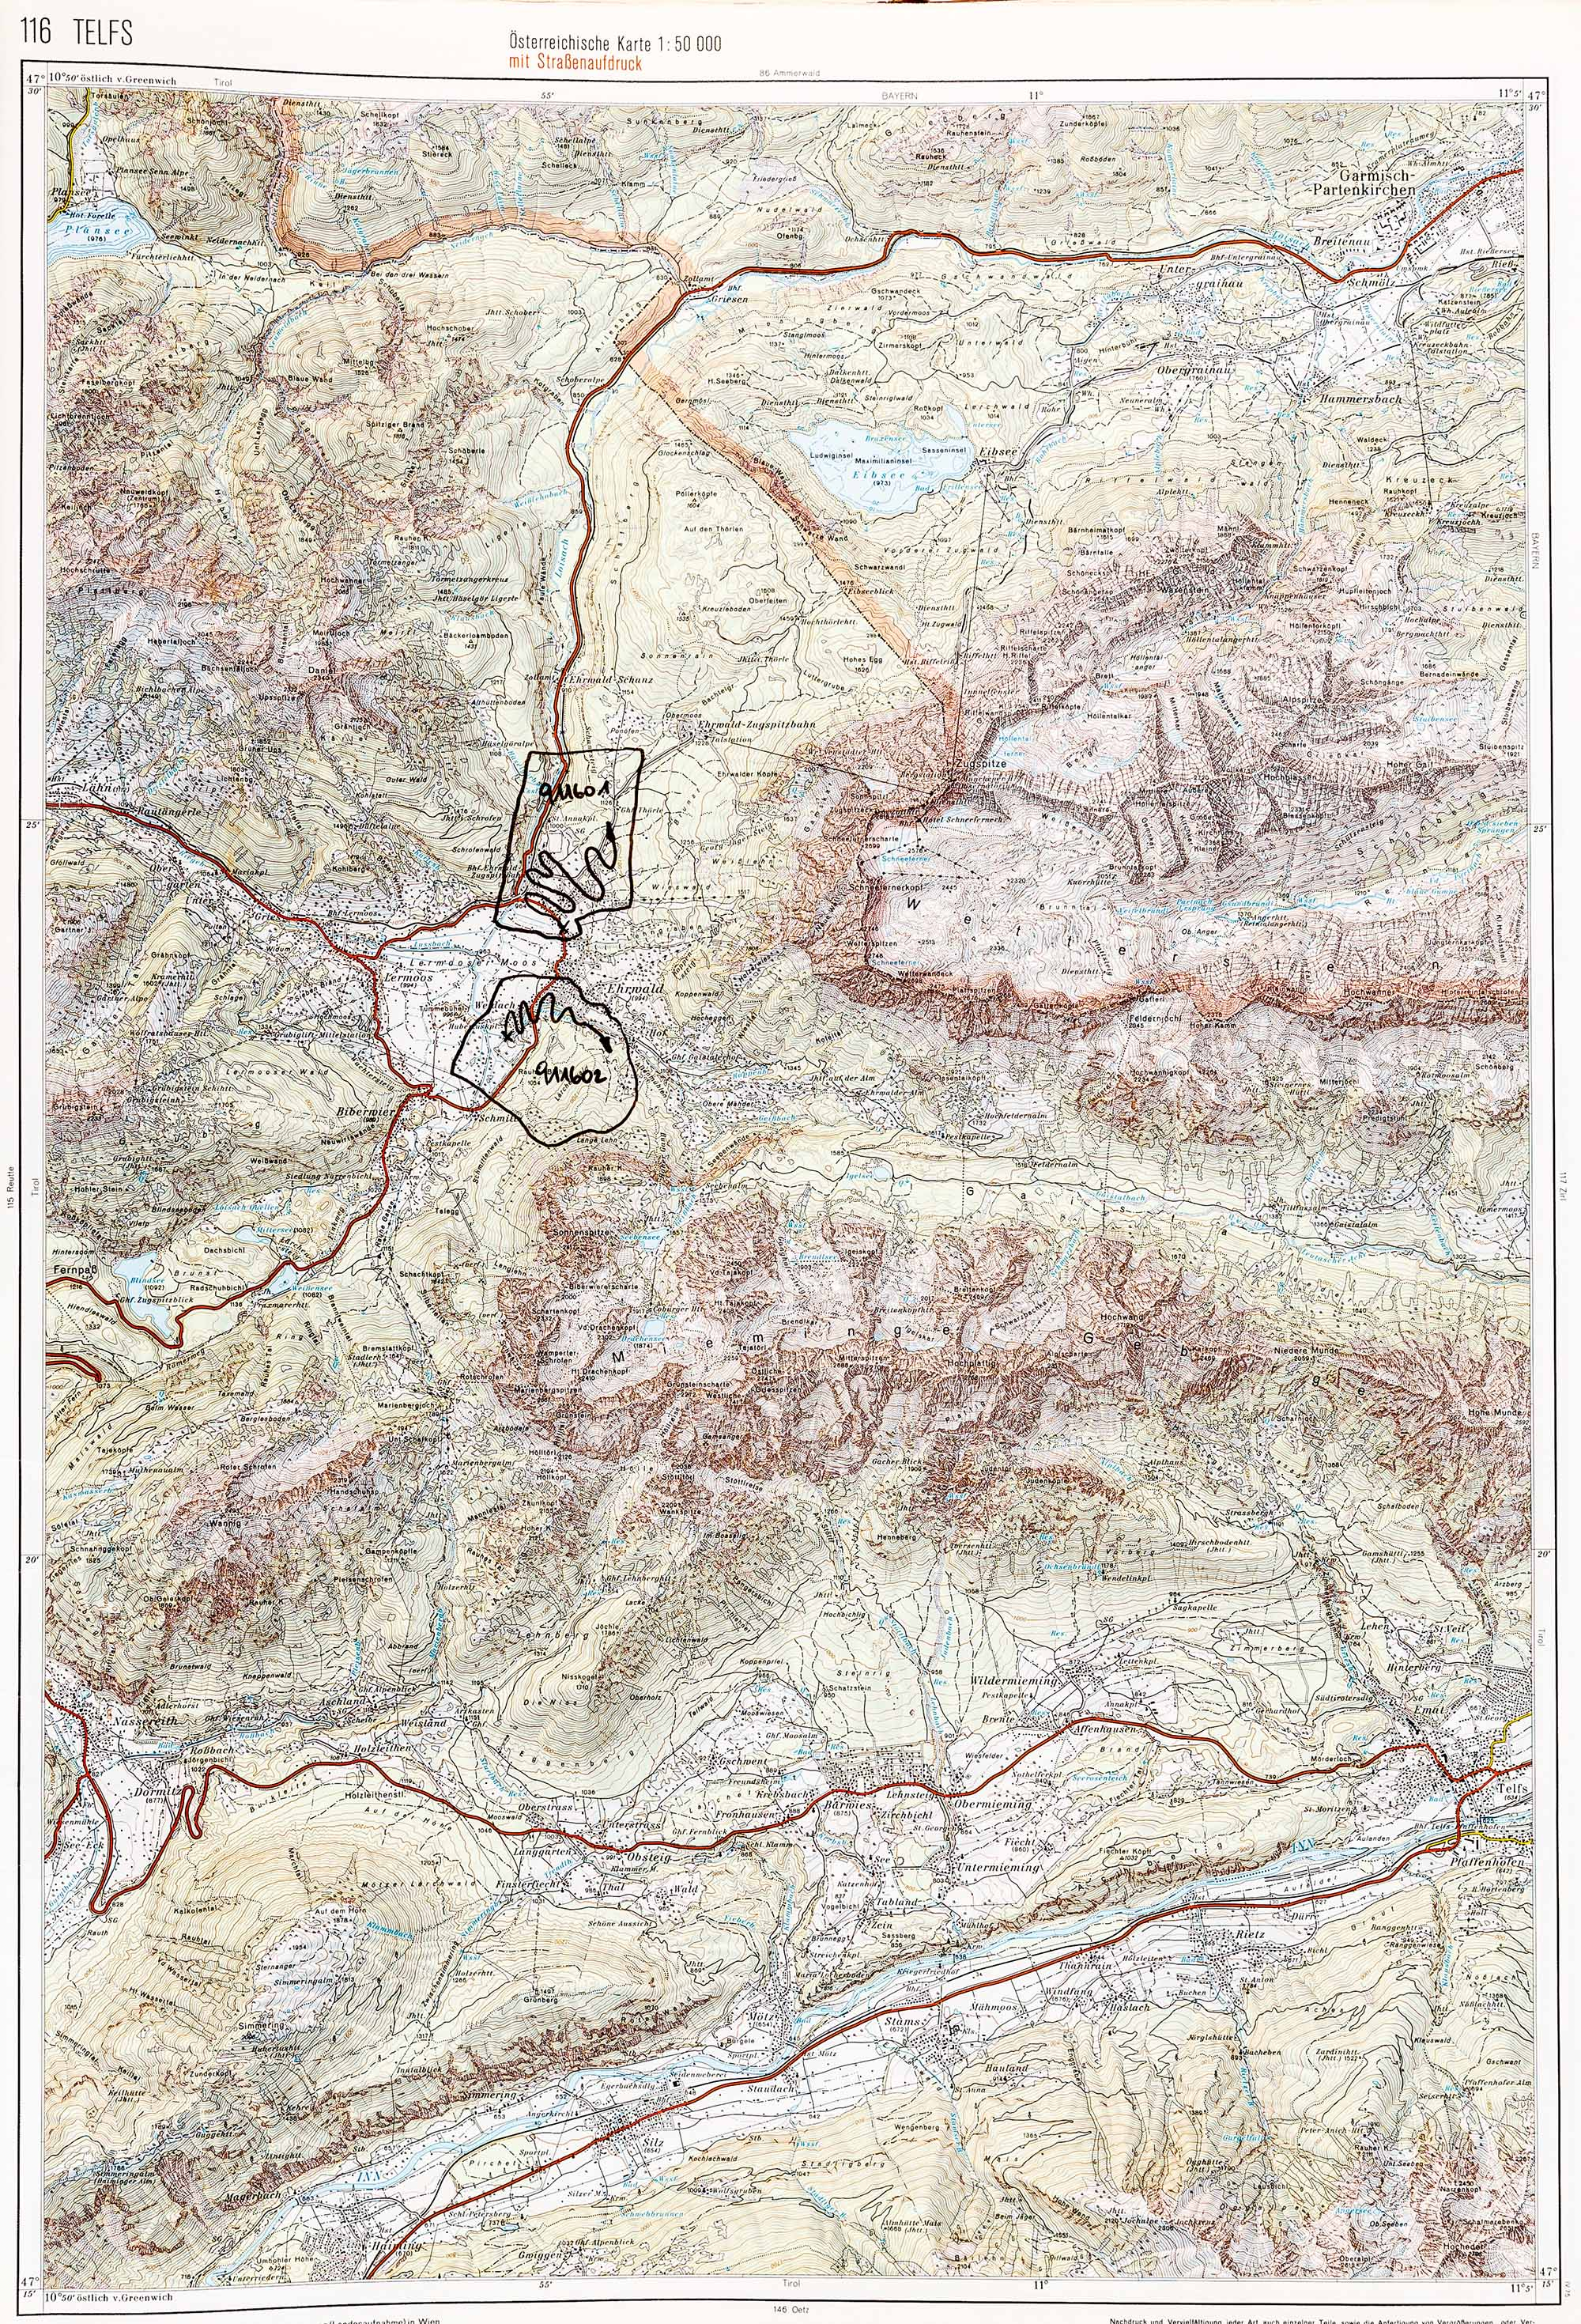 1975-1979 Karte 116